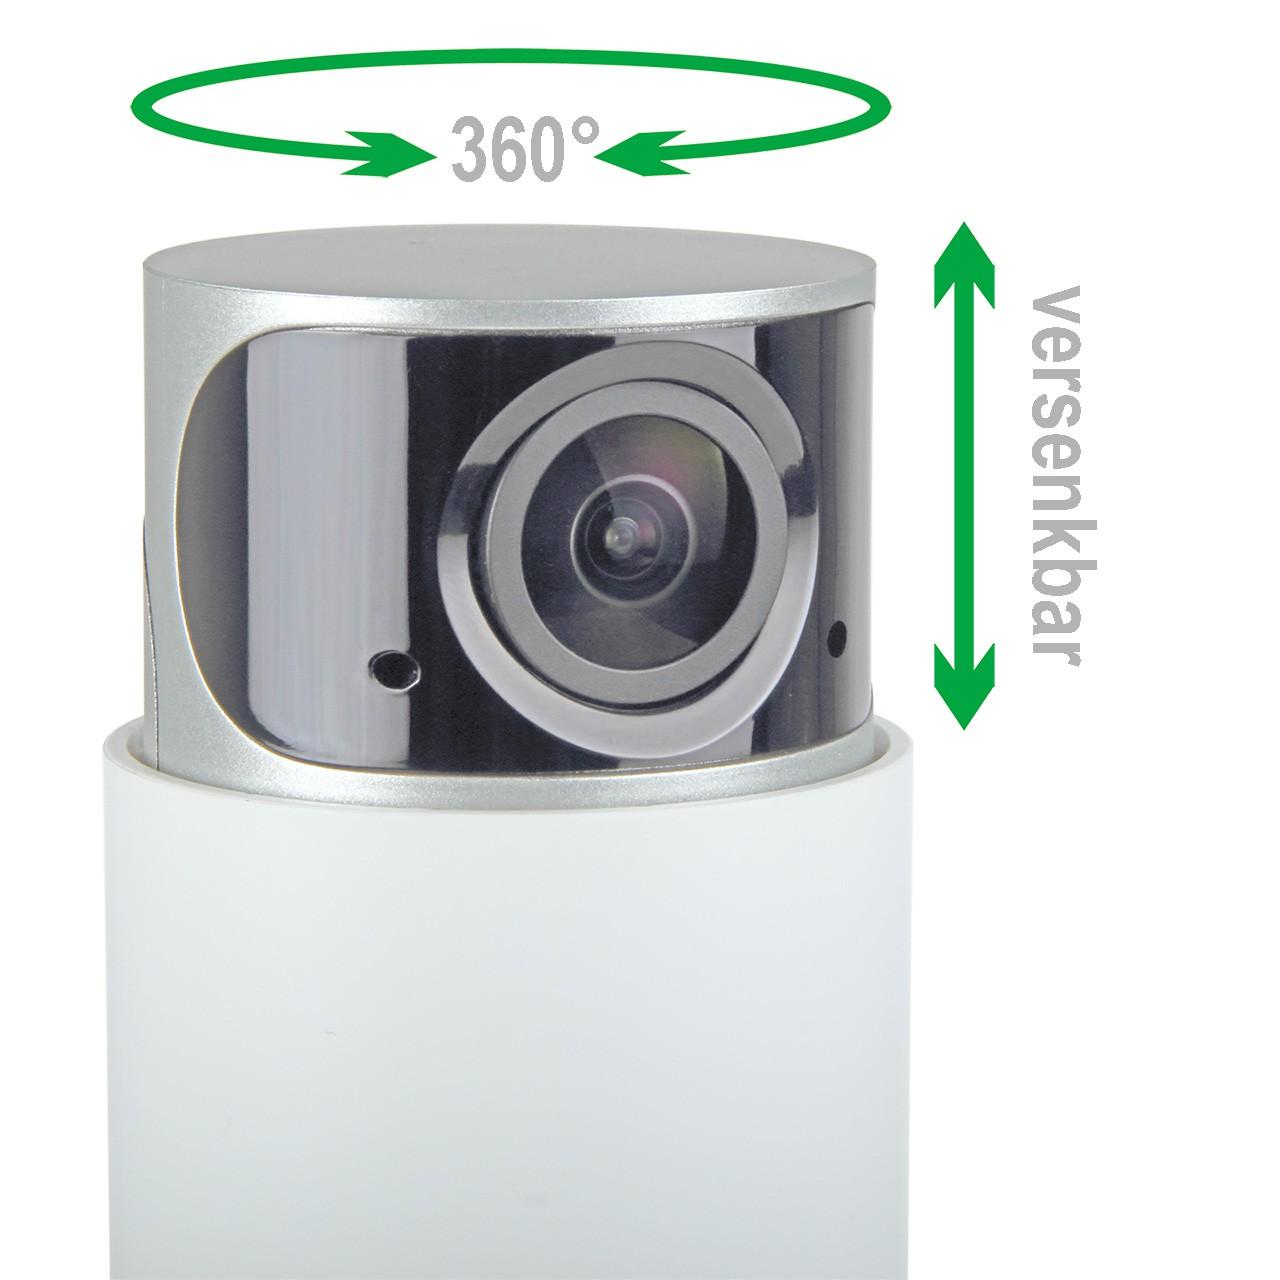 bosch smart home 360 innenkamera vs elektro. Black Bedroom Furniture Sets. Home Design Ideas